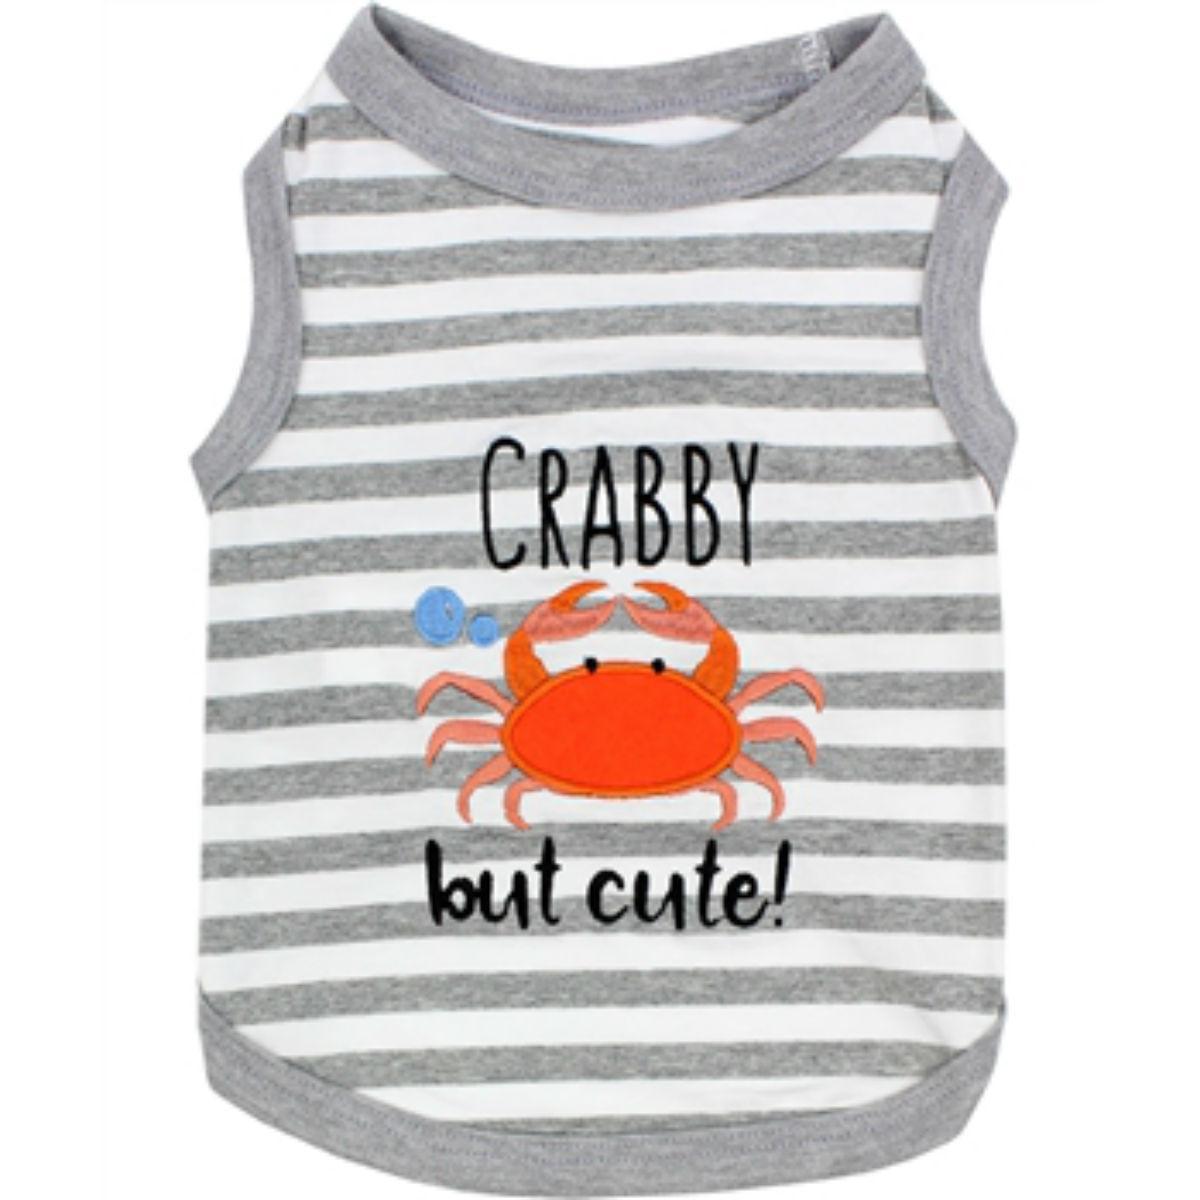 Crabby but Cute Dog Tank by Parisian Pet - Gray